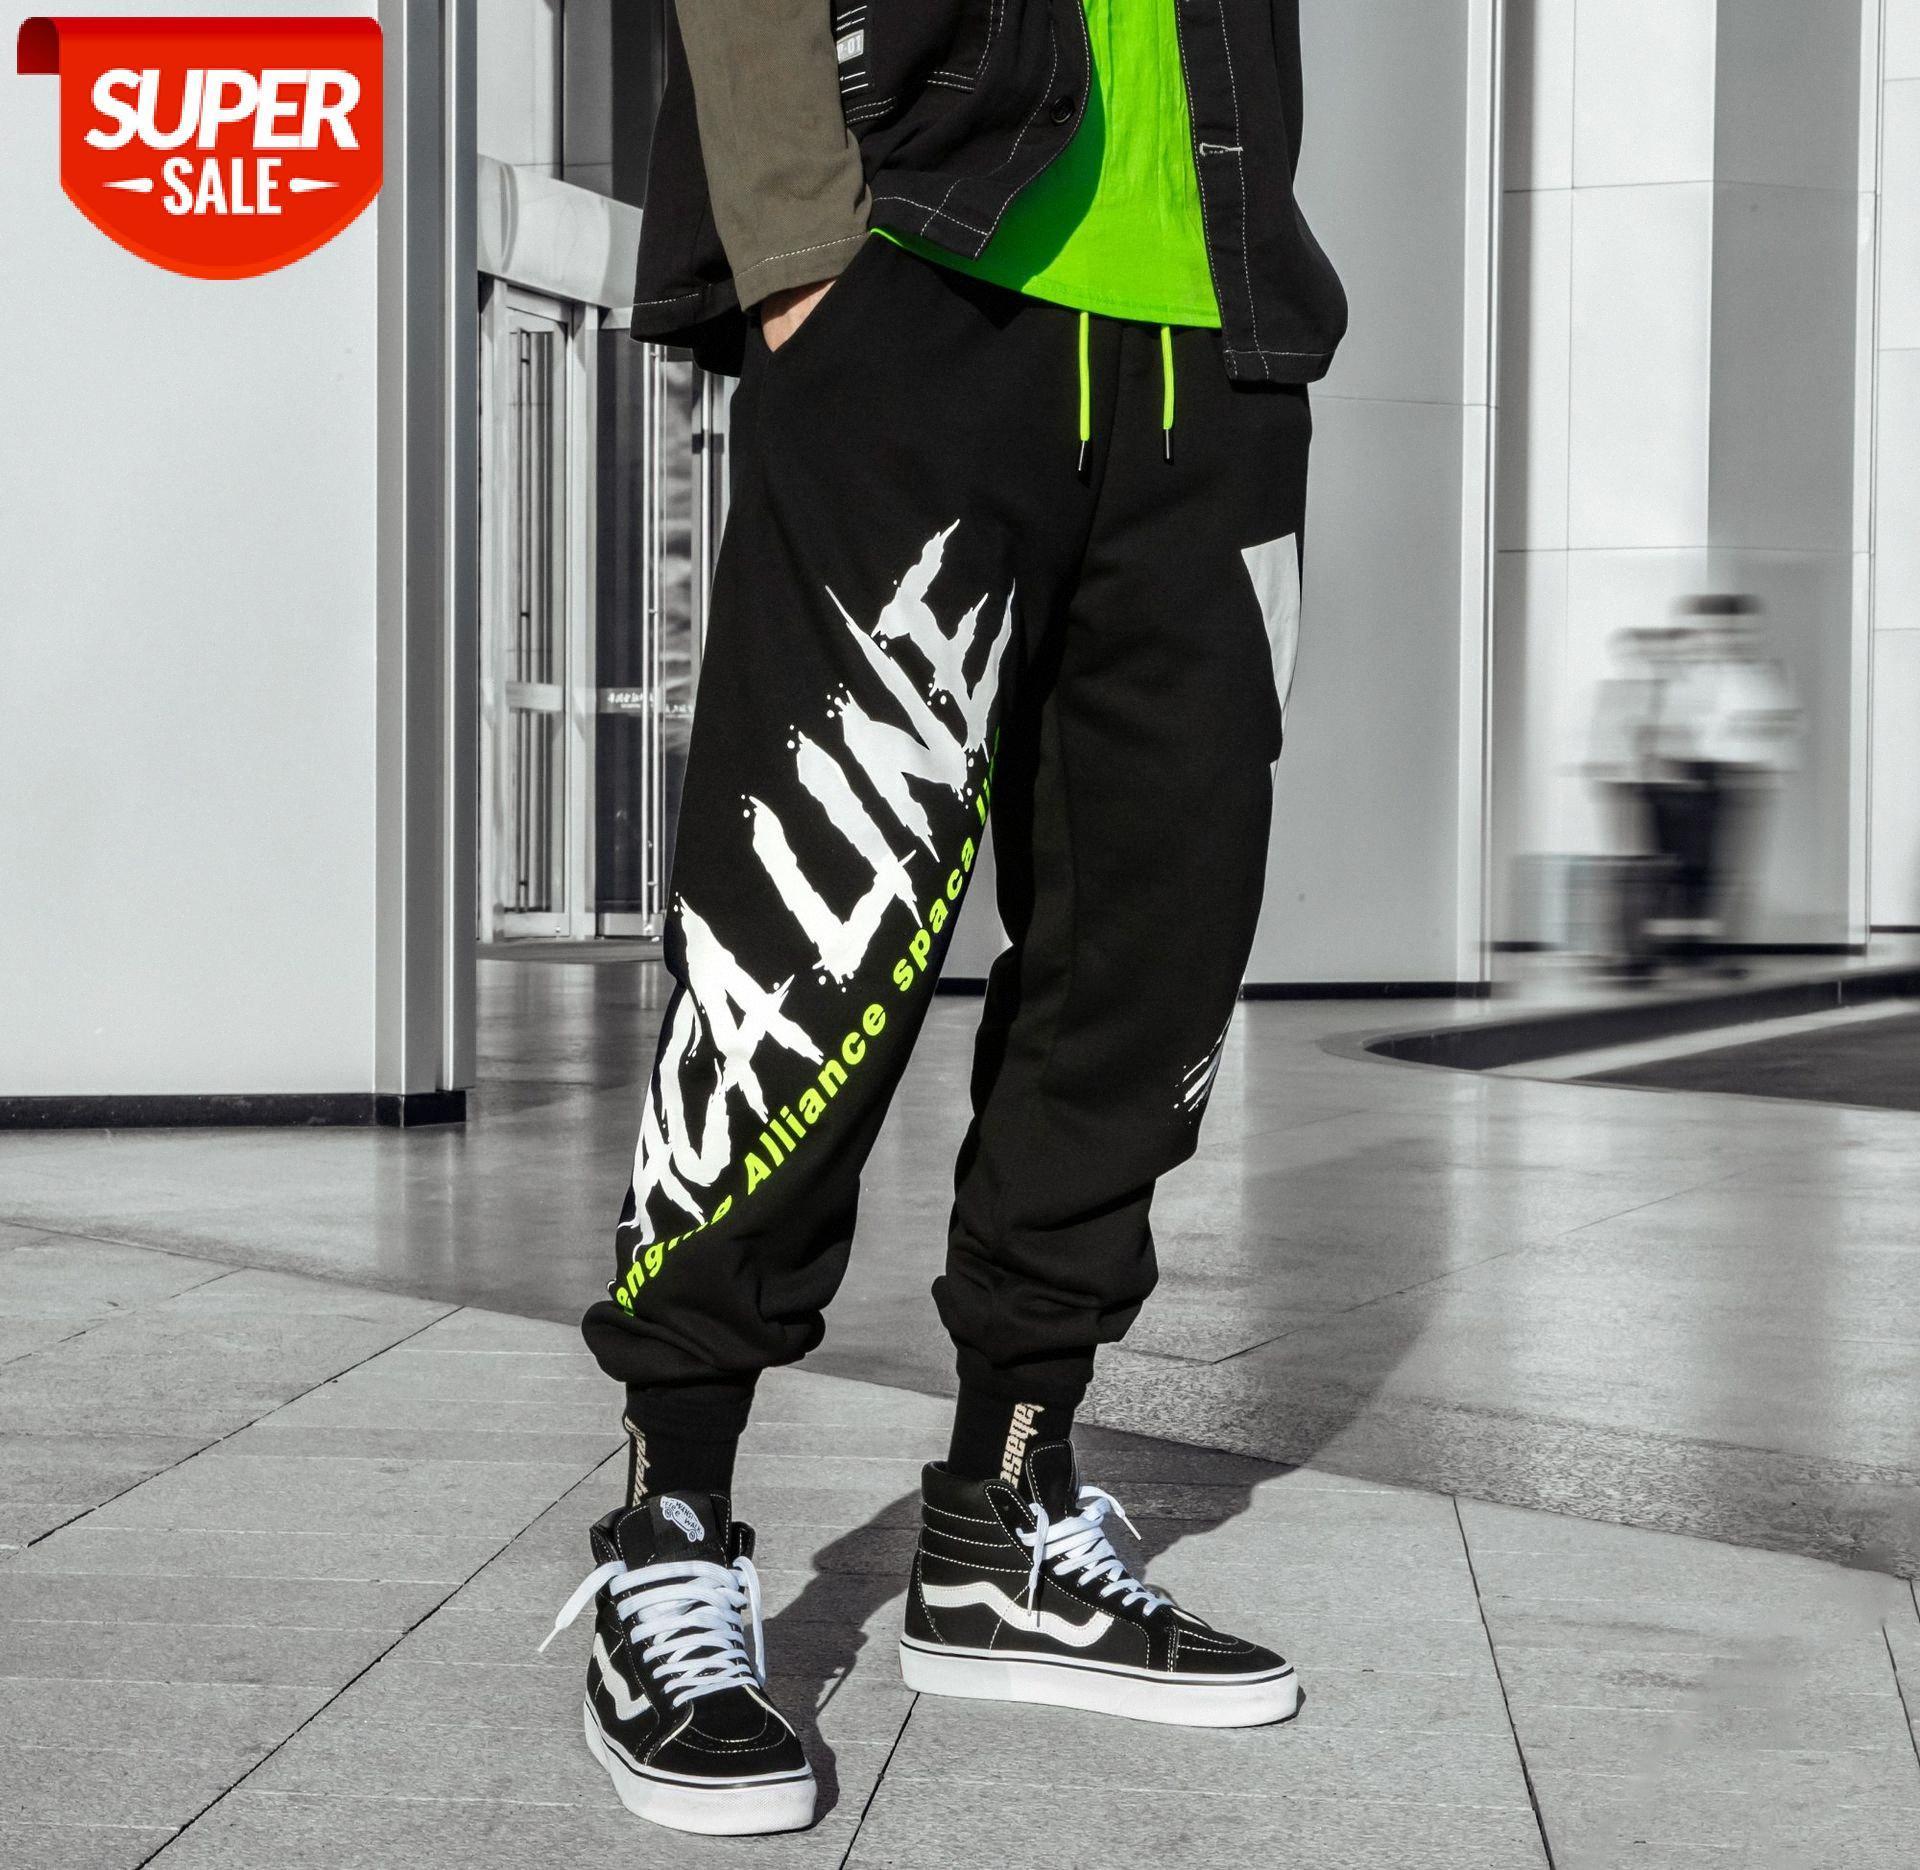 Sokak Rahat Tayt Pantolon erkek Mektup Baskı Hip-Hop Ayaklar Spor Pamuk Uzun # TD4J